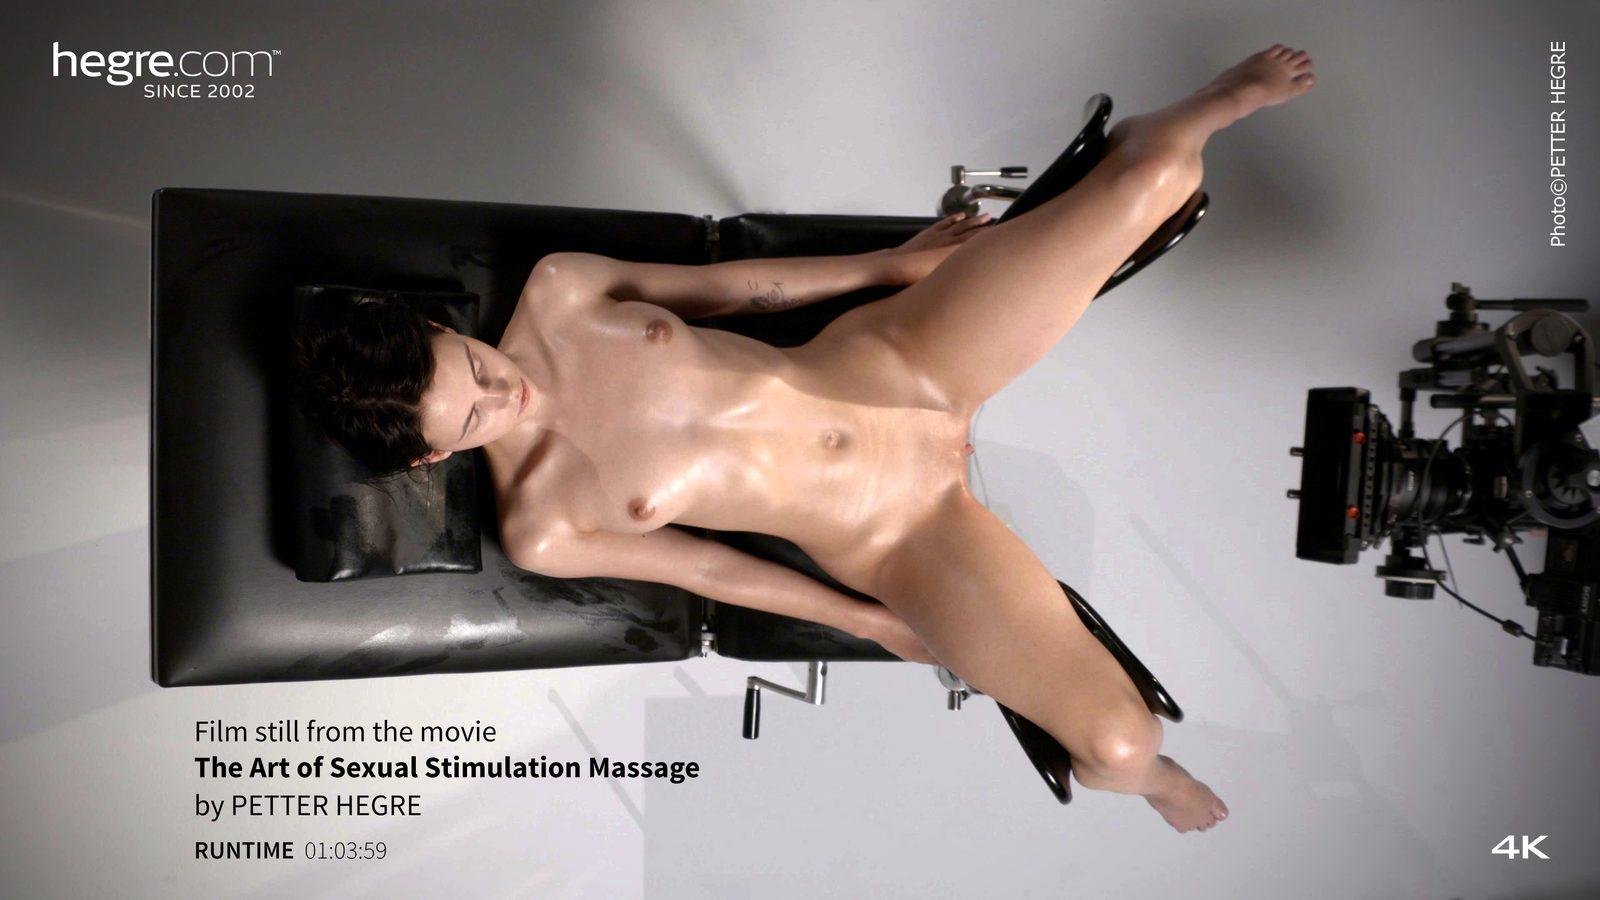 8a5049 Hegre-Art 2017-06-20 The Art of Sexual Stimulation Massage 1080P